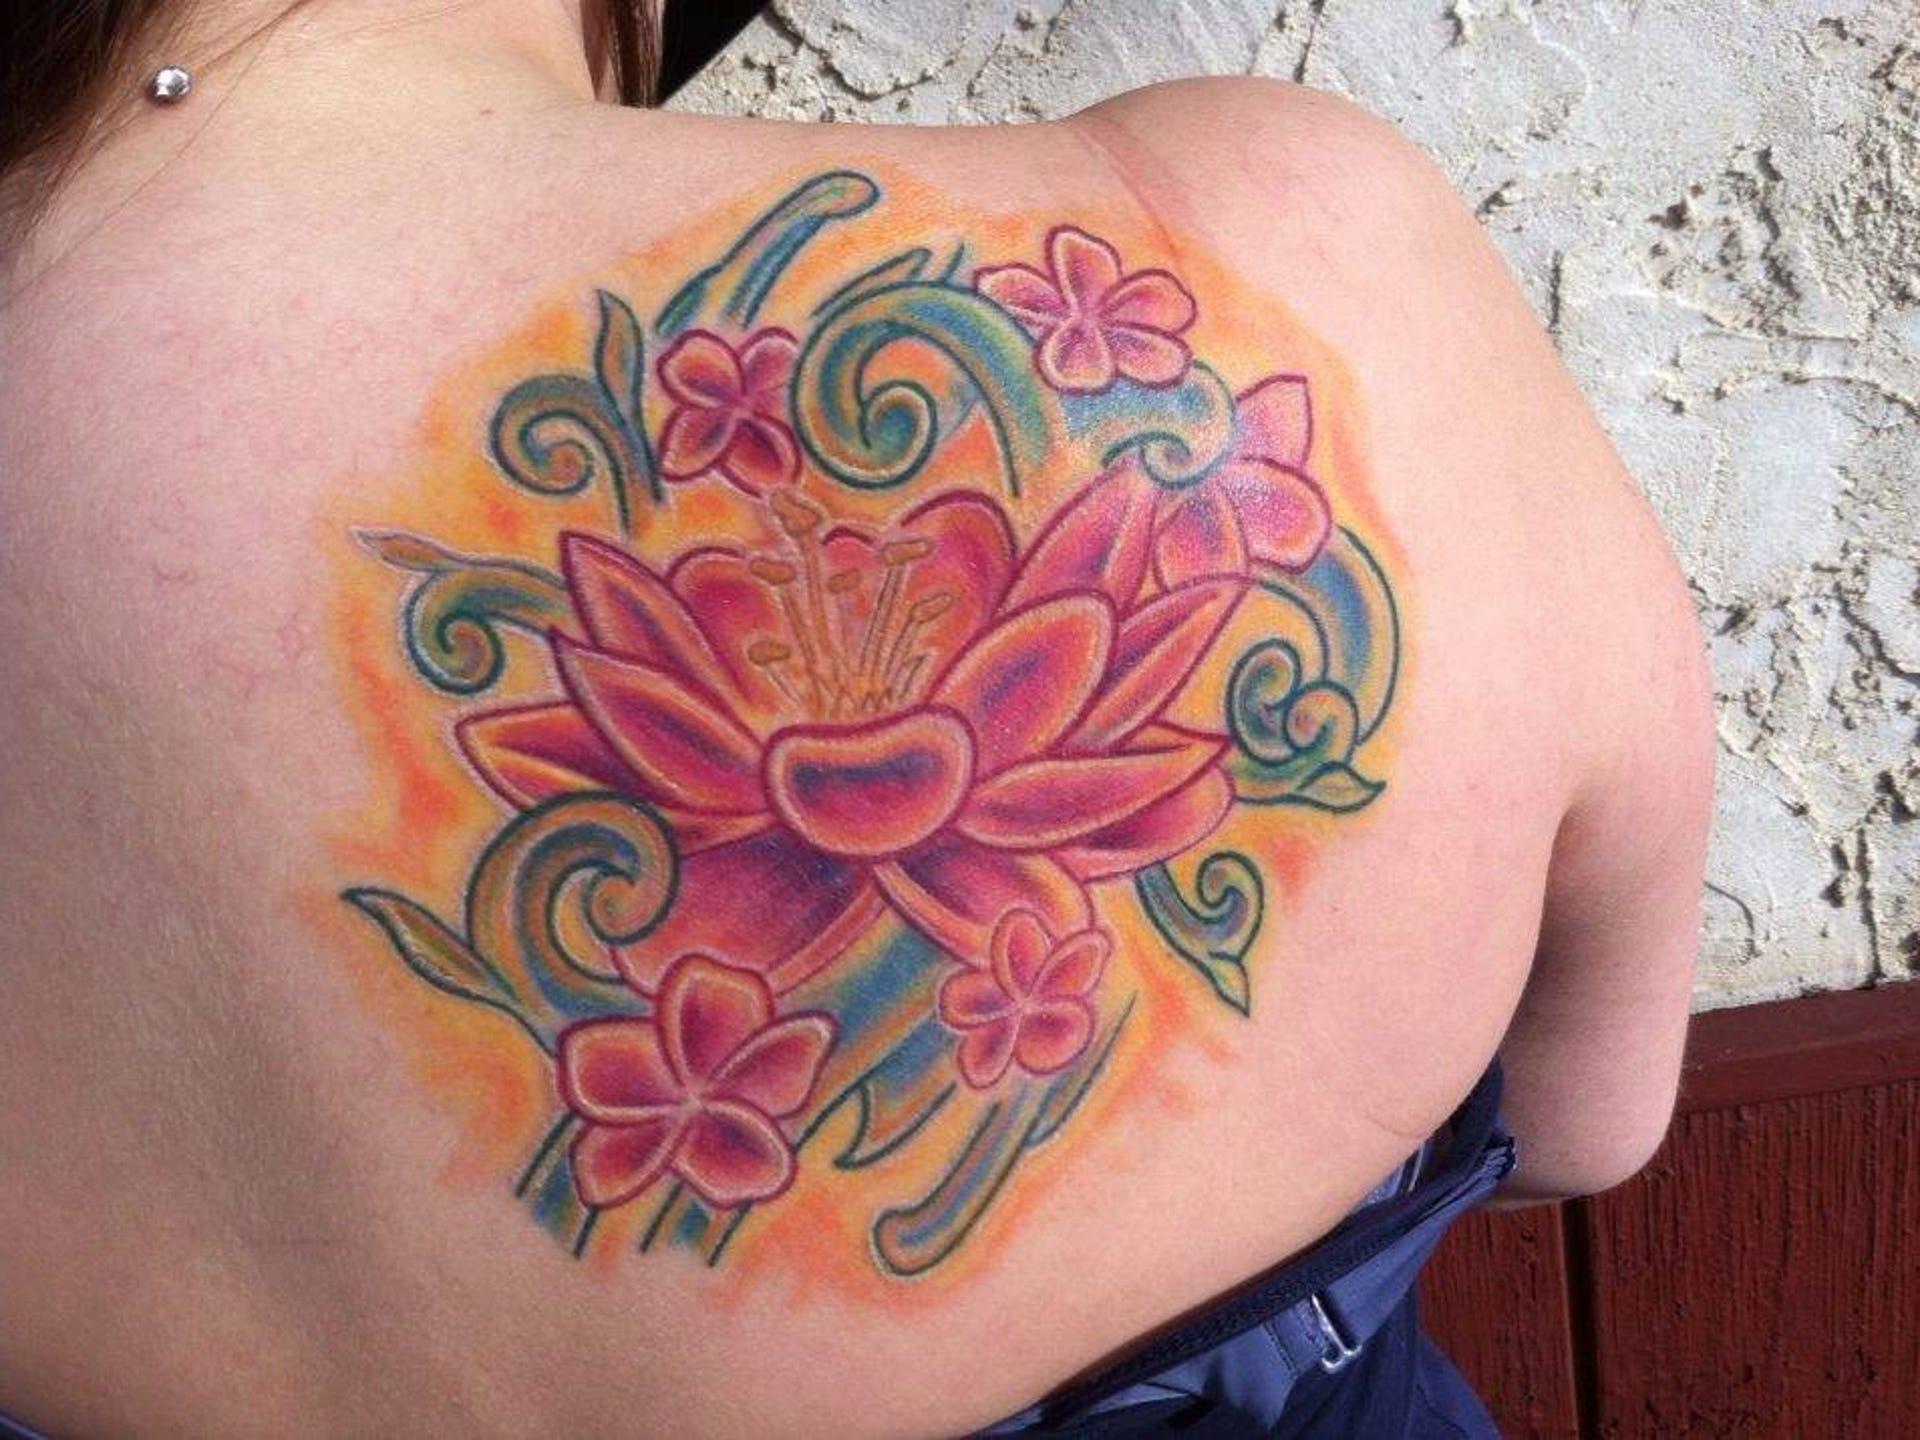 Tattoos By Chris Burns Of Chris James Tattoo Studio